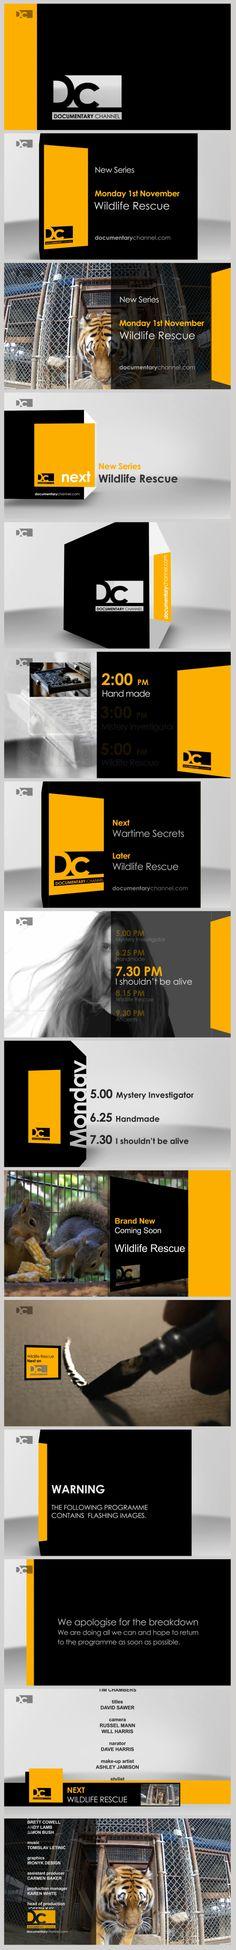 Design - TV Channel Branding 1 | VideoHive